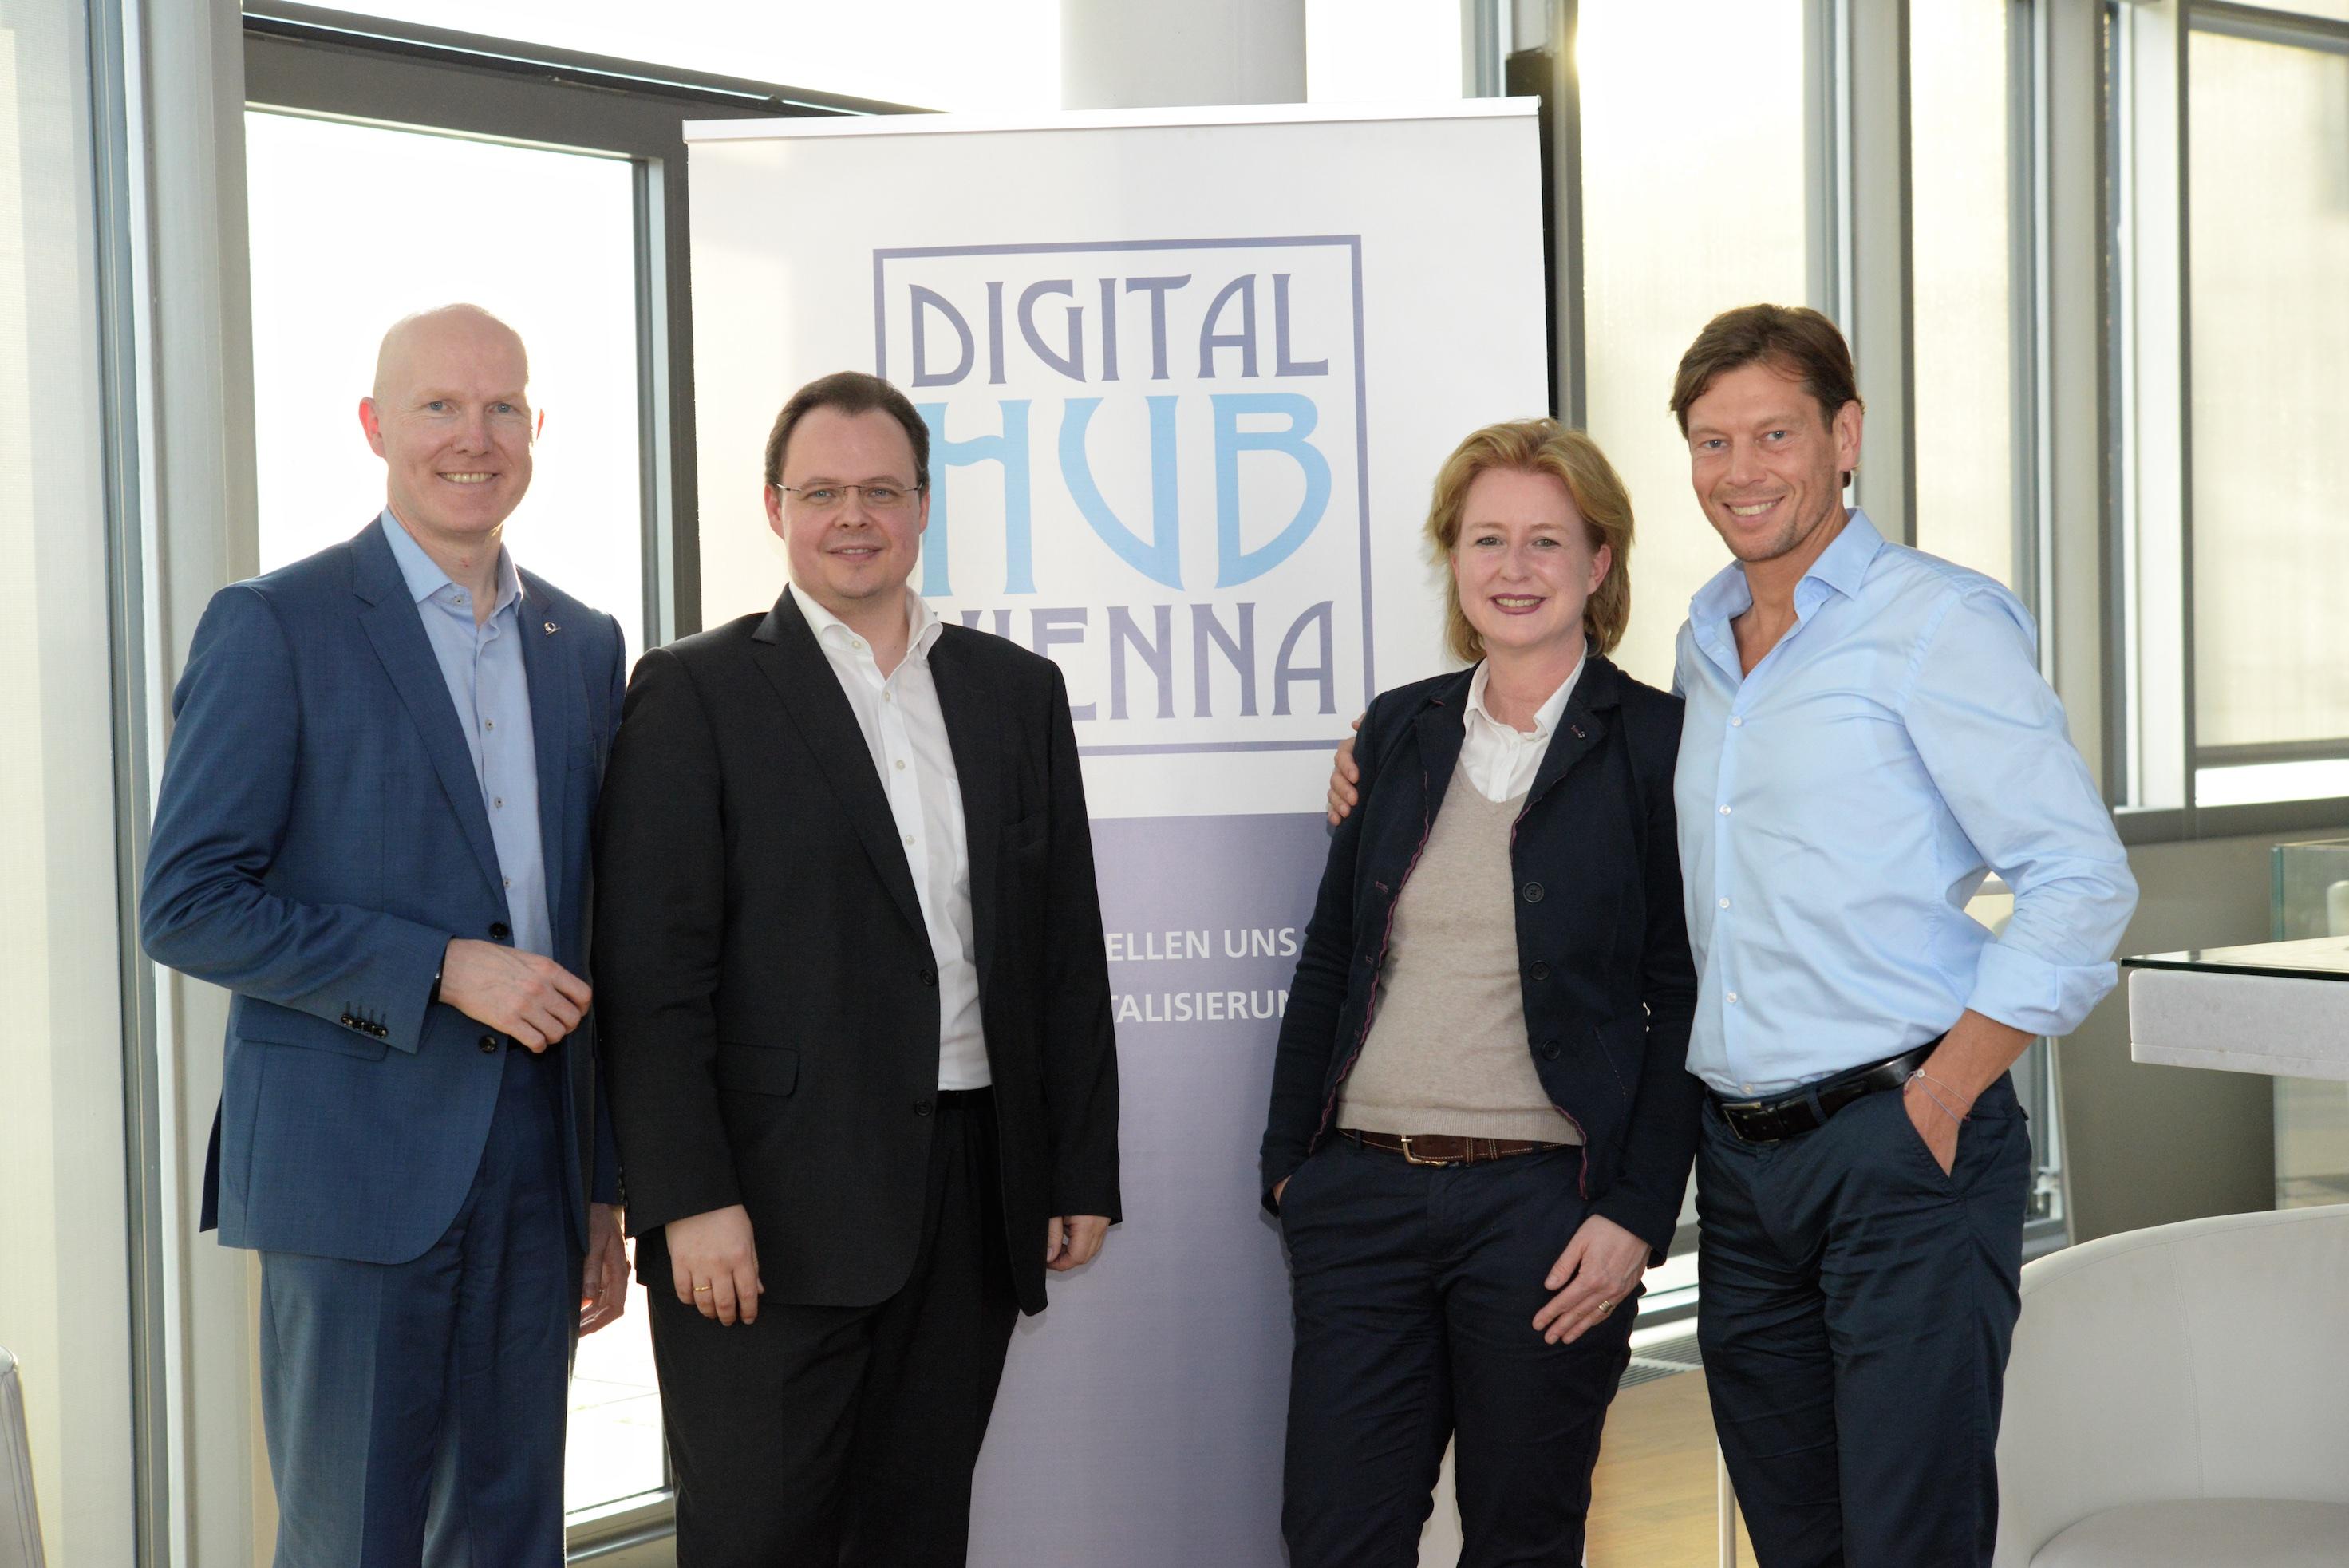 Digital Hub Vienna, 11.5.2017: Alexander Böckelmann (UNIQA), Michael Siegmund (Gründer Digital Hub Vienna/ Ancoreage), Birgit Kraft-Kinz (Gründerin Digital Hub Vienna/ KRAFTKINZ GmbH), Thomas Polak (UNIQA)